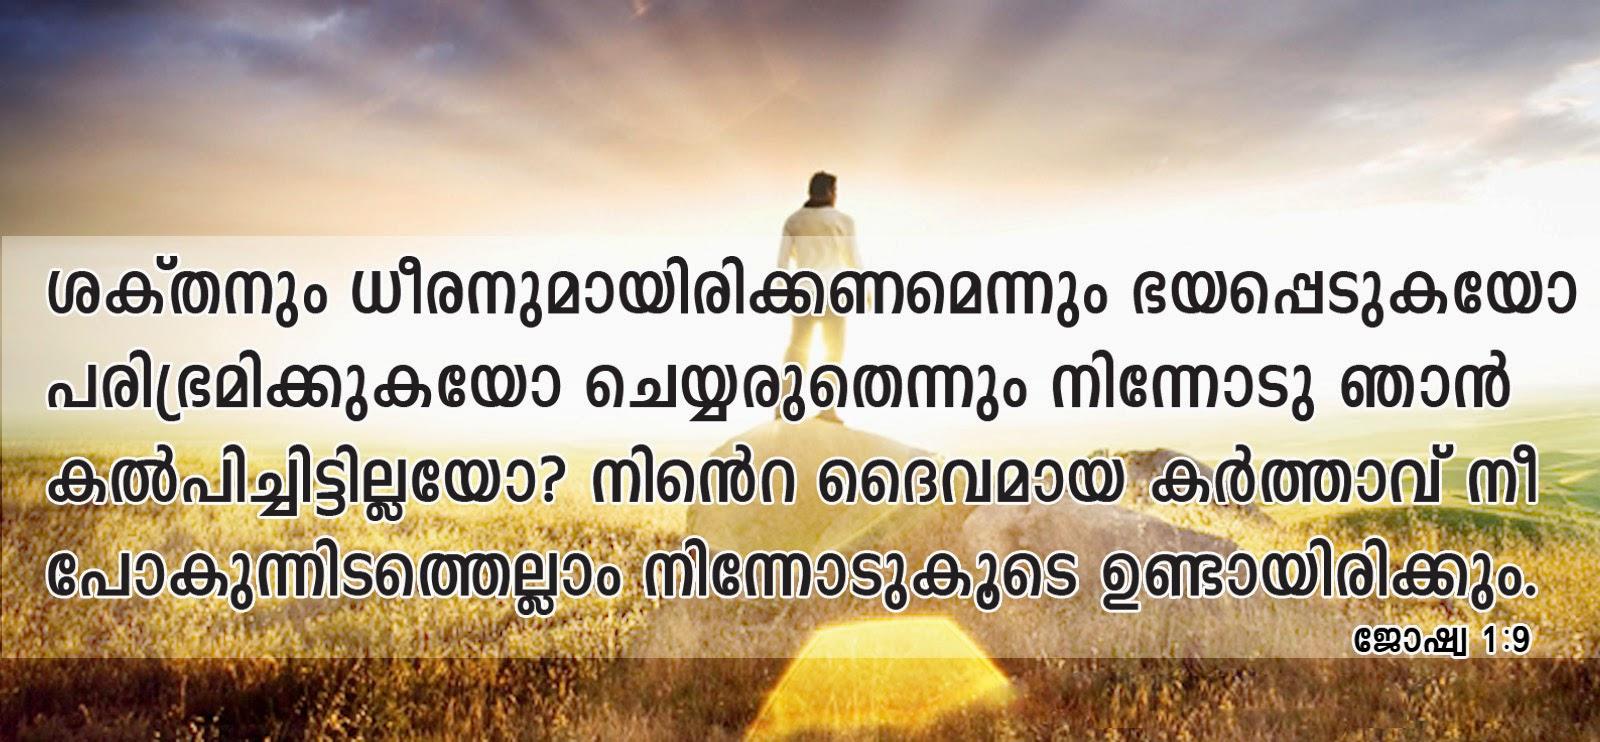 malayalam bible quotes kerala catholics